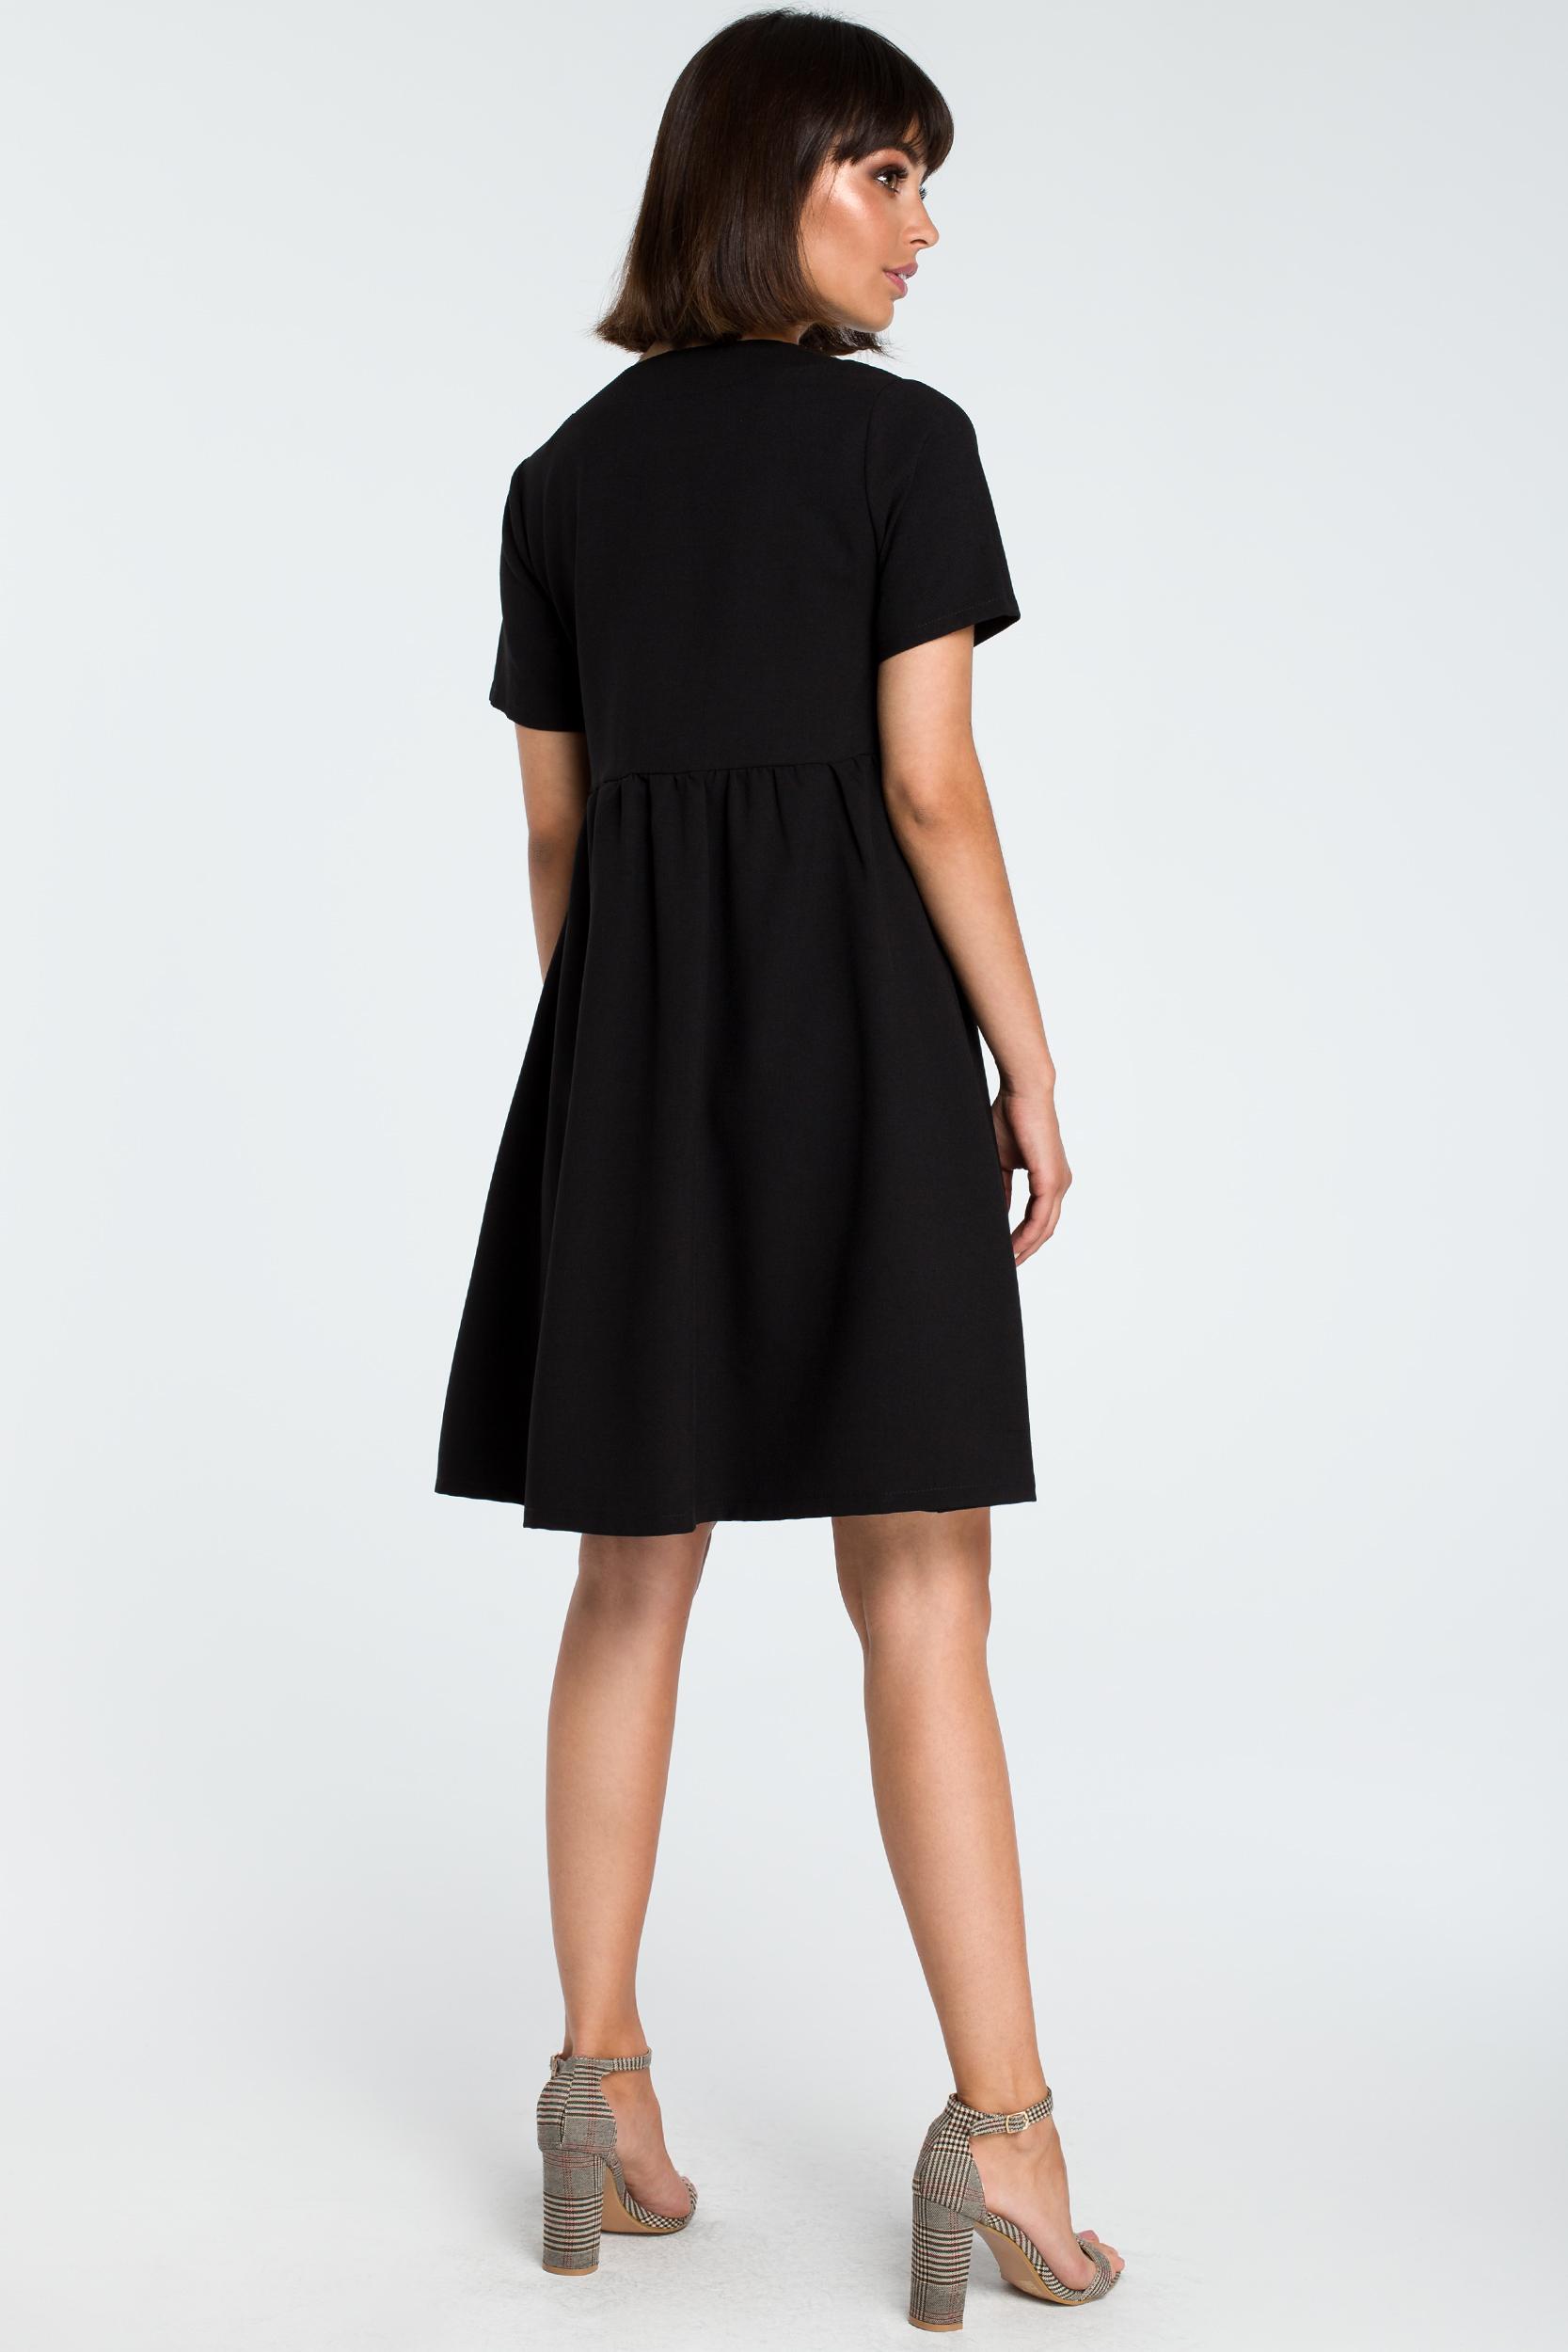 CM3757 Sukienka mini odcinana pod biustem - czarna